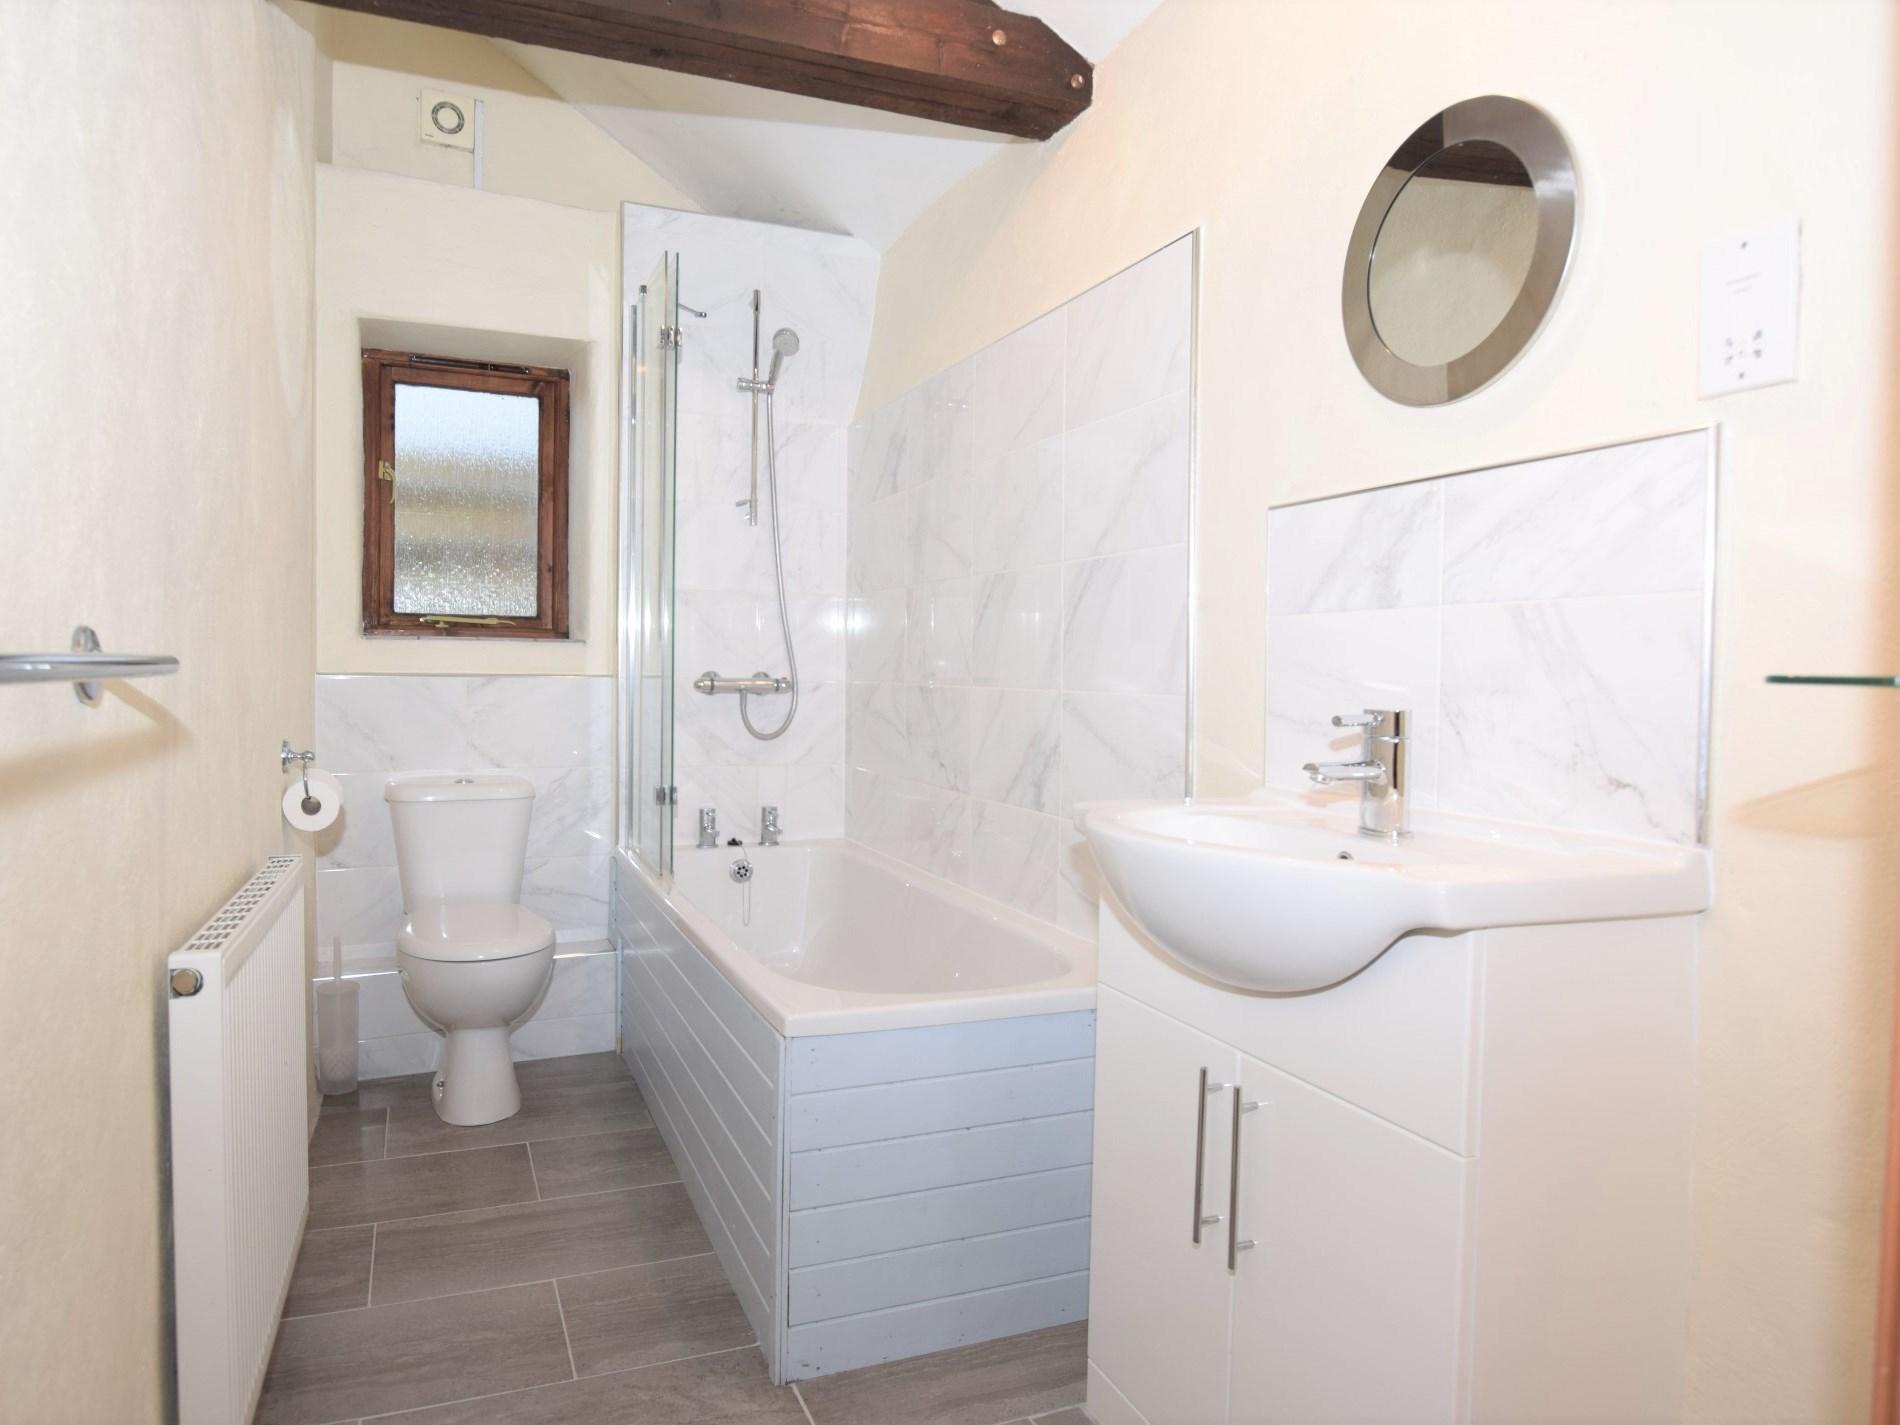 1 Bedroom Barn in West Cornwall, Cornwall